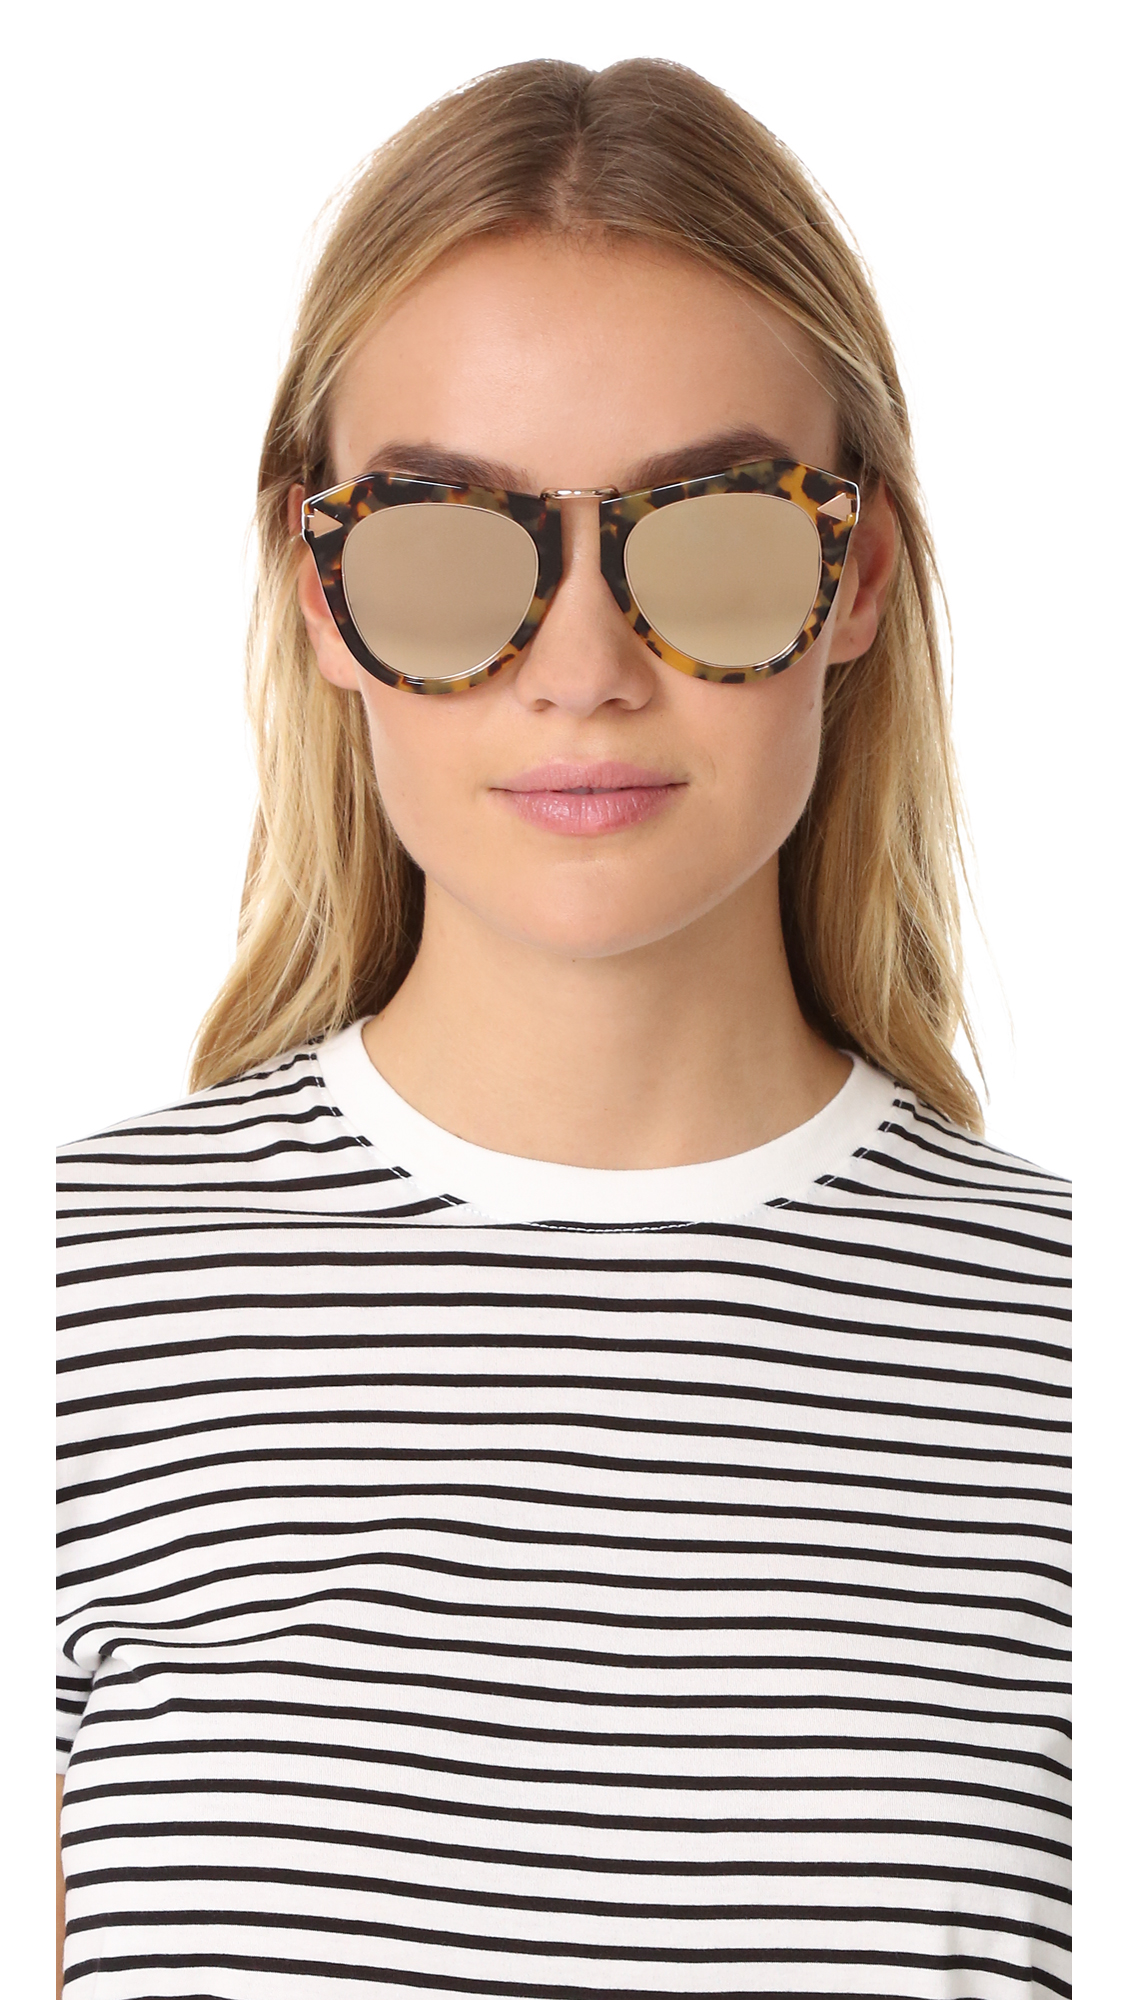 b3f7b0279cb4 Karen Walker One Orbit Superstar Sunglasses